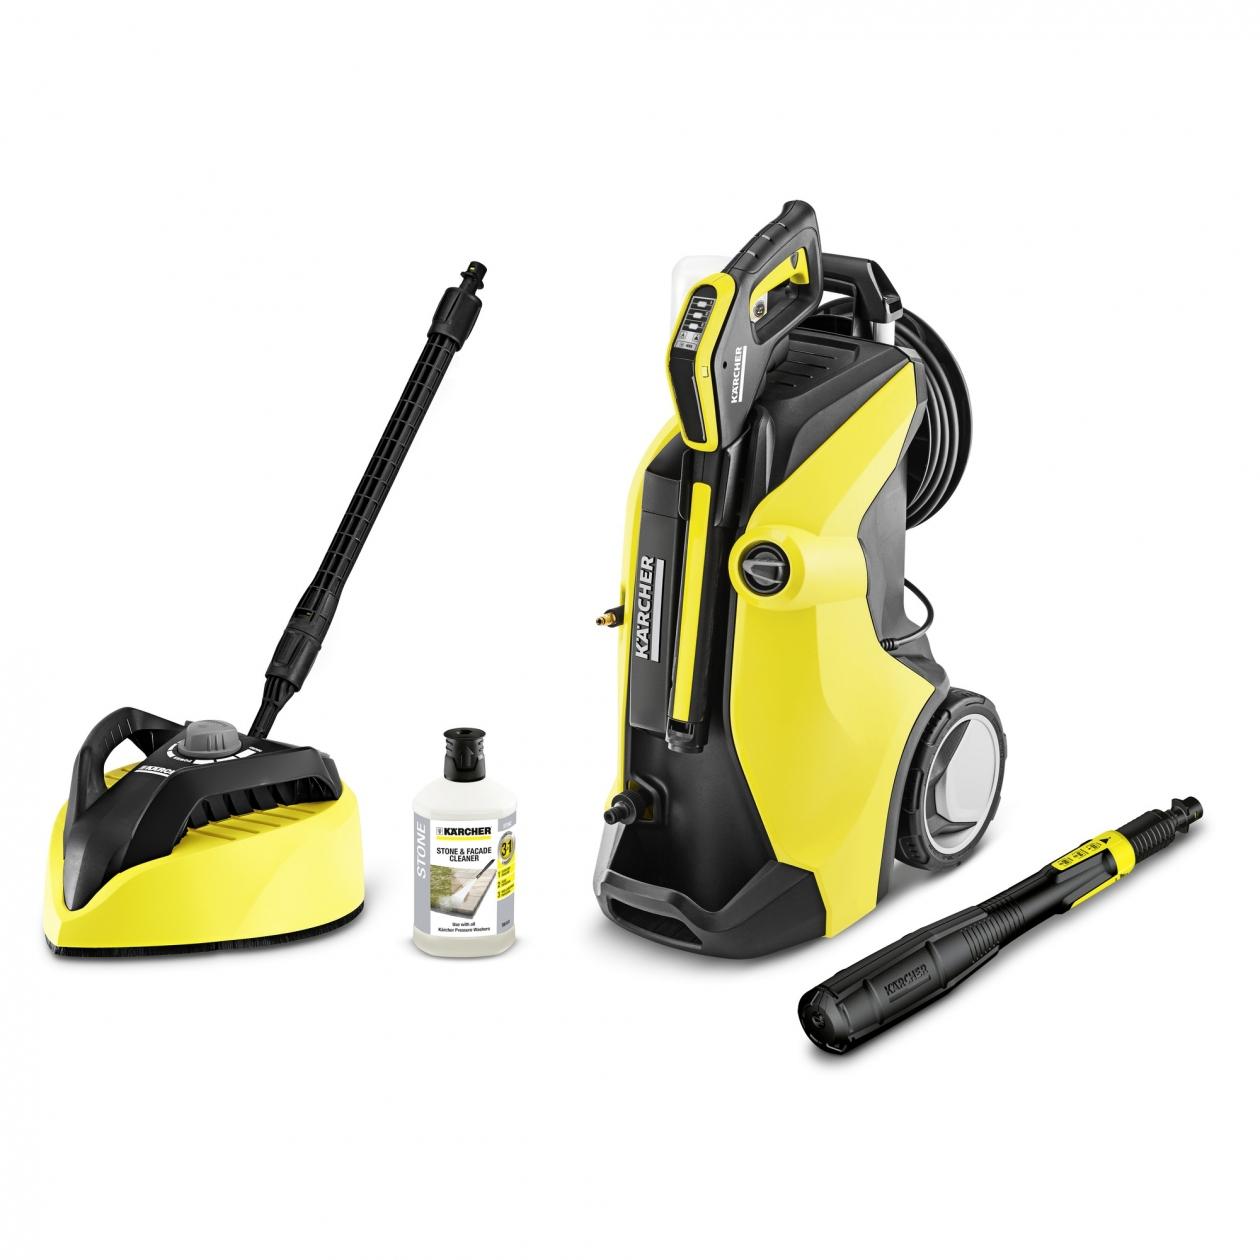 Vysokotlaký čistič Kärcher K 7 Premium Full Control Plus 1.317-133